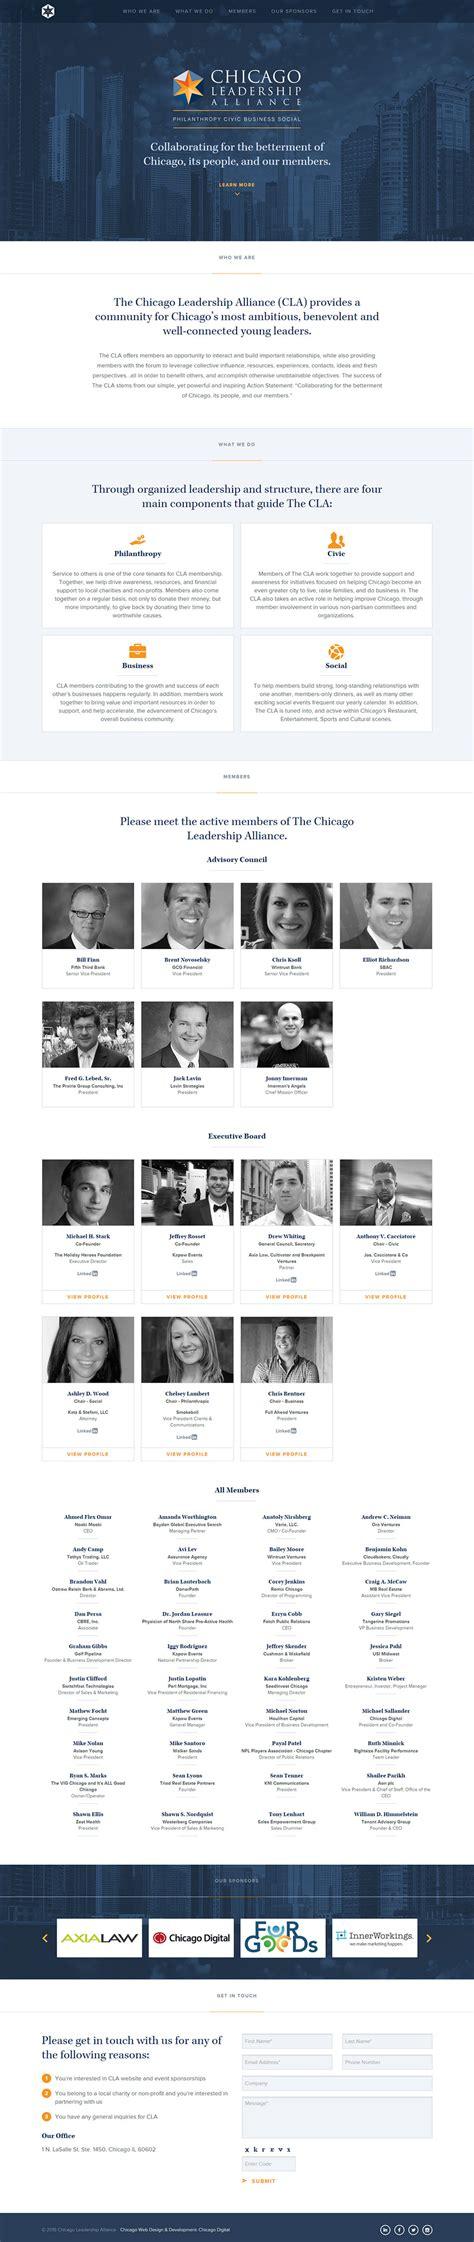 chicago leadership alliance responsive web design